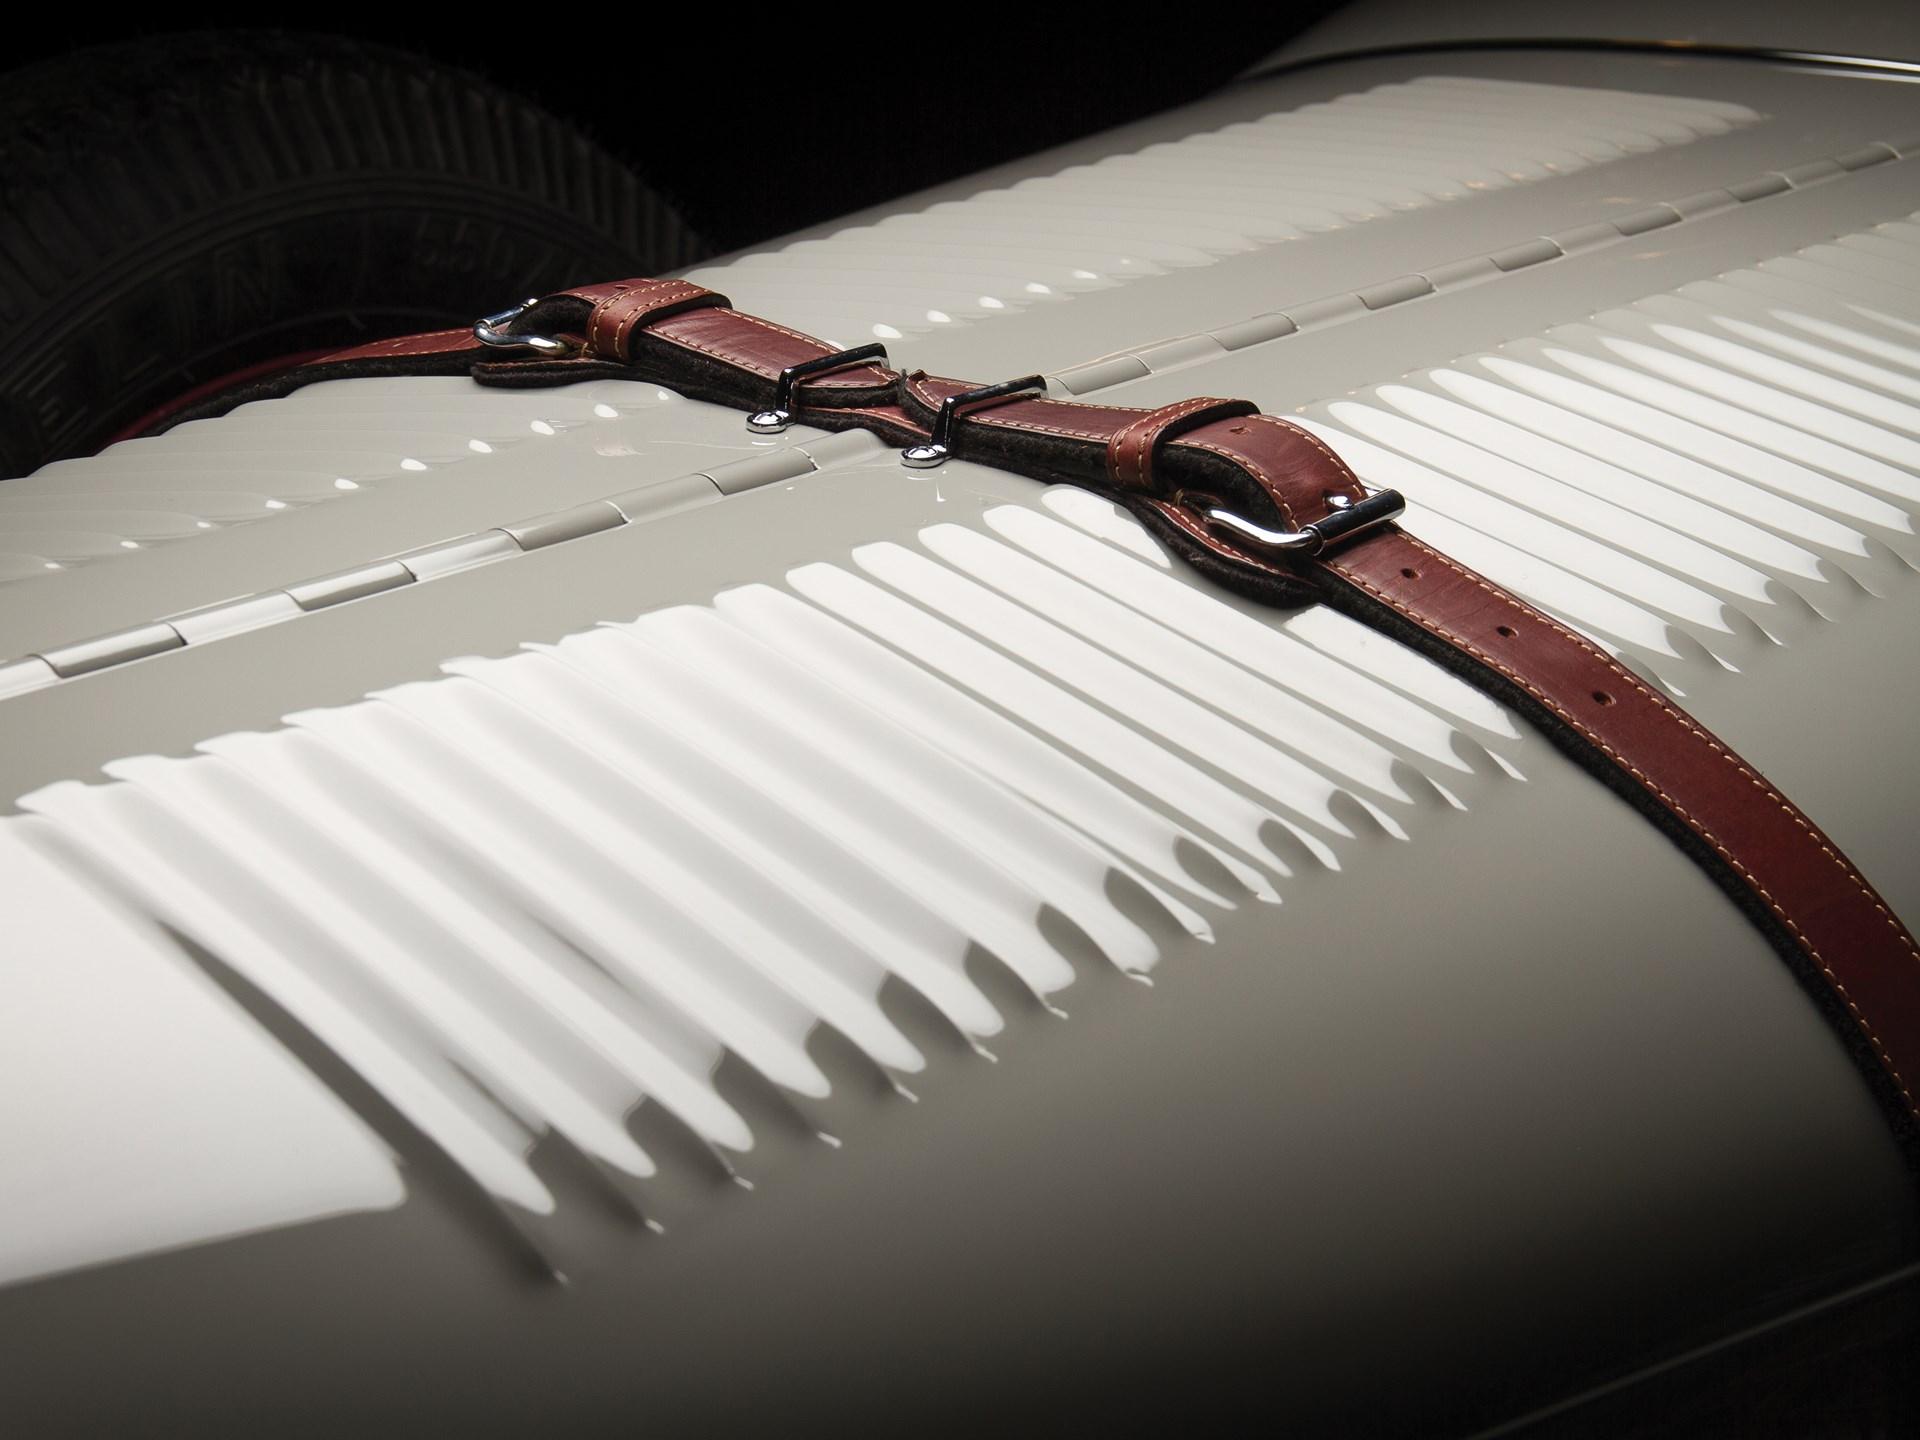 1928 Mercedes-Benz 680S Torpedo Roadster by Carrosserie J. Saoutchik